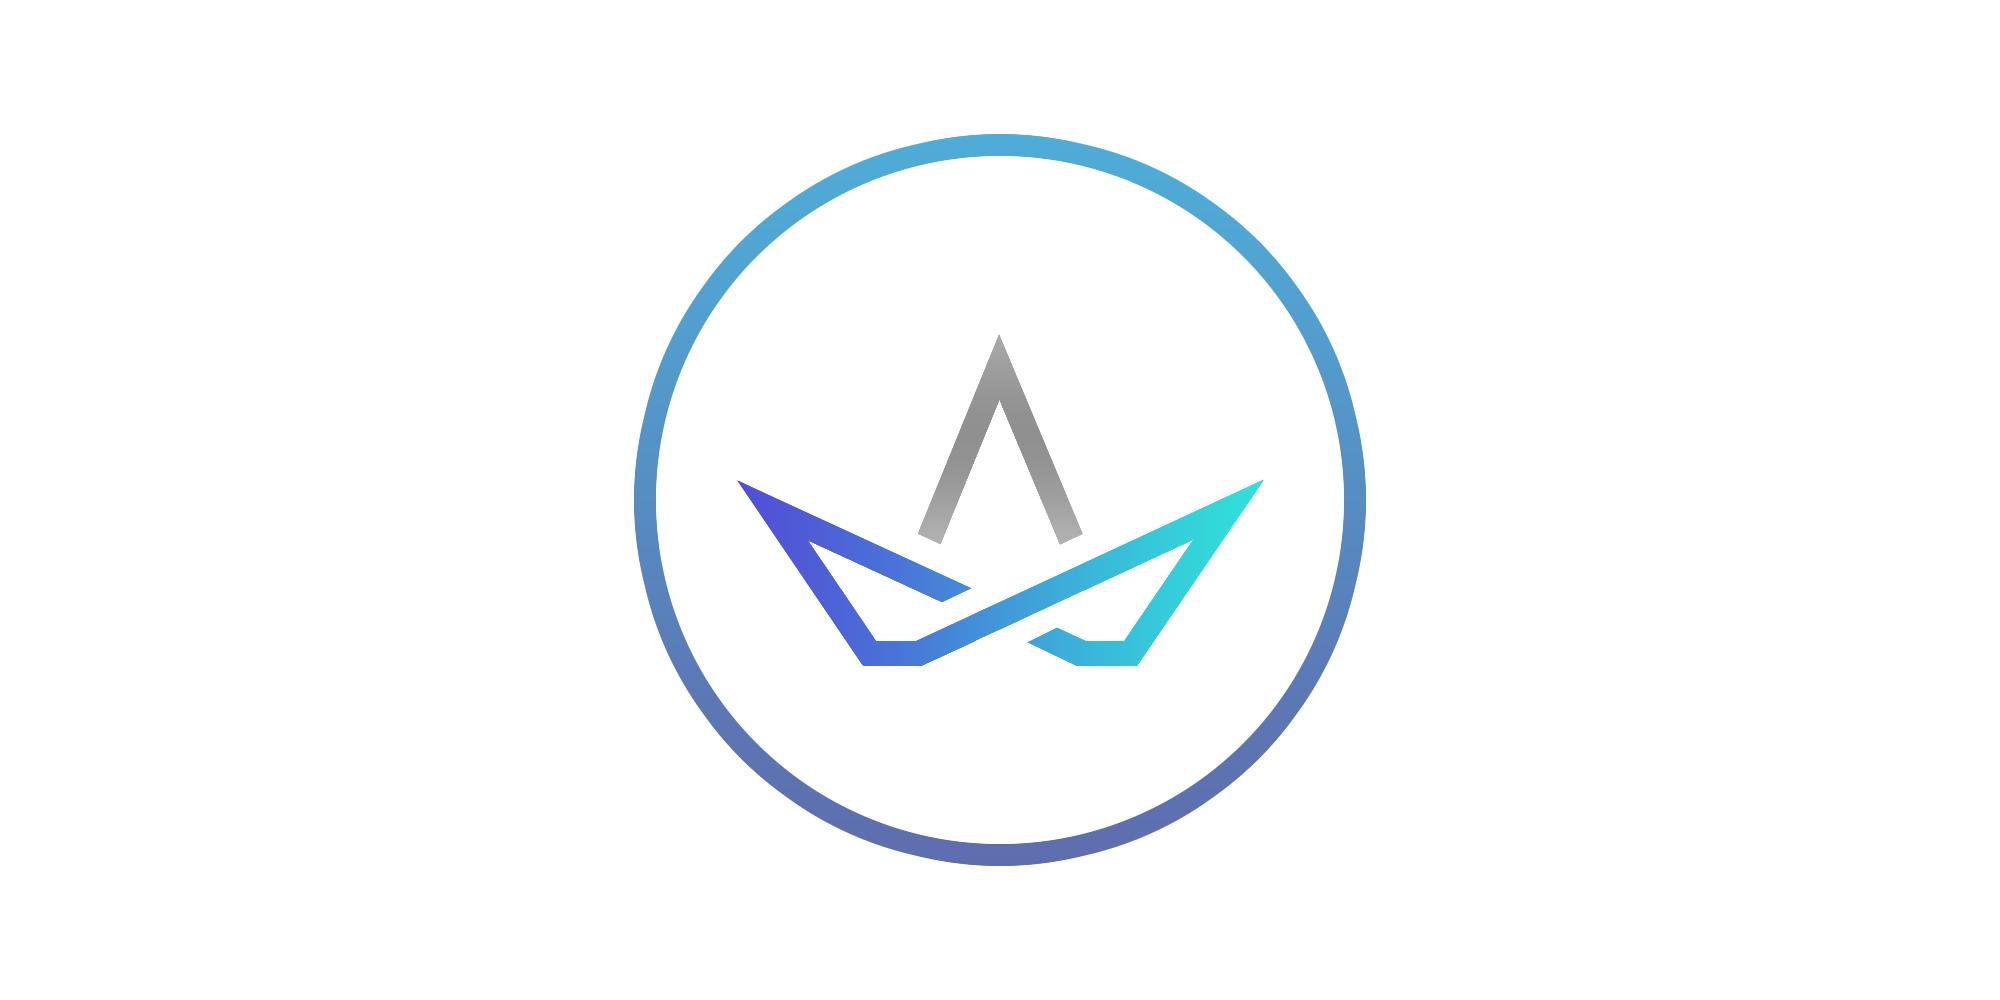 https://nikwebsite.com/wp-content/plugins/kingcomposer/assets/images/get_start.jpg